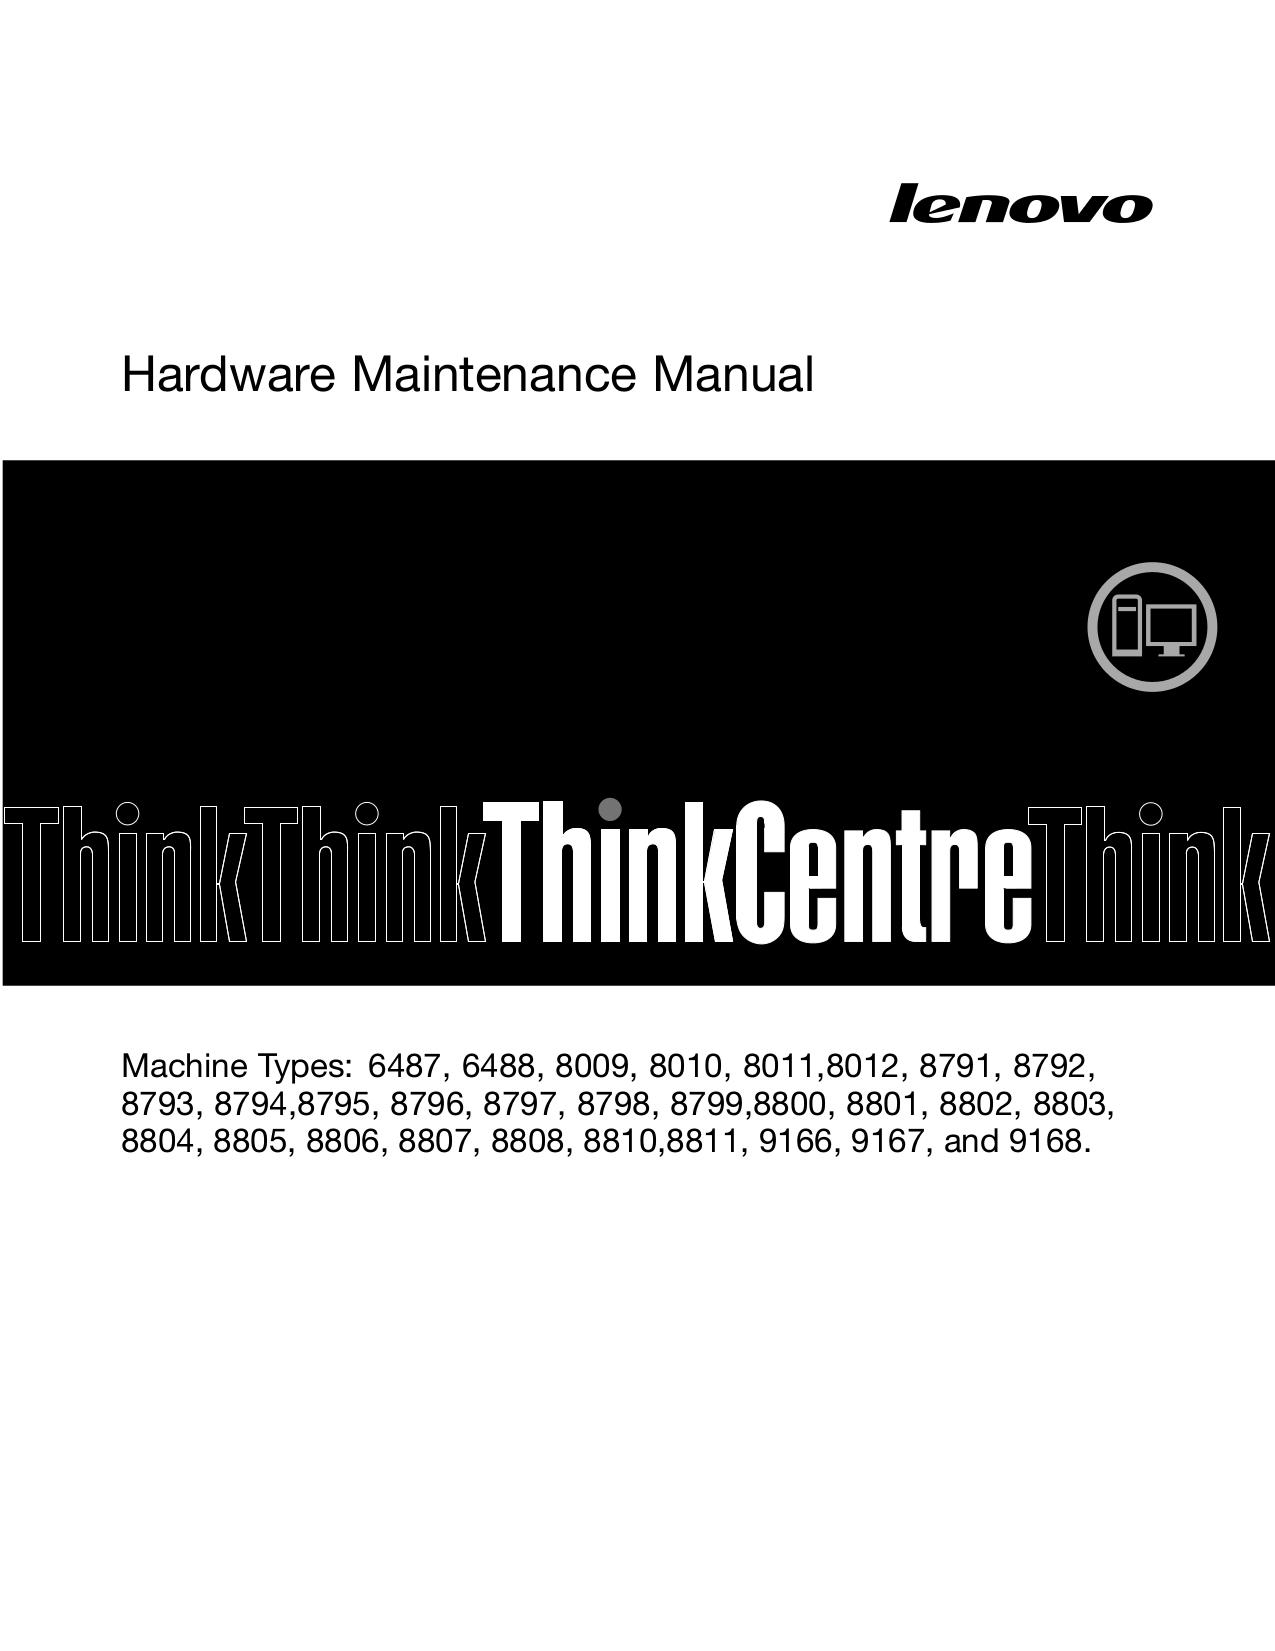 pdf for Lenovo Desktop ThinkCentre M55 6487 manual